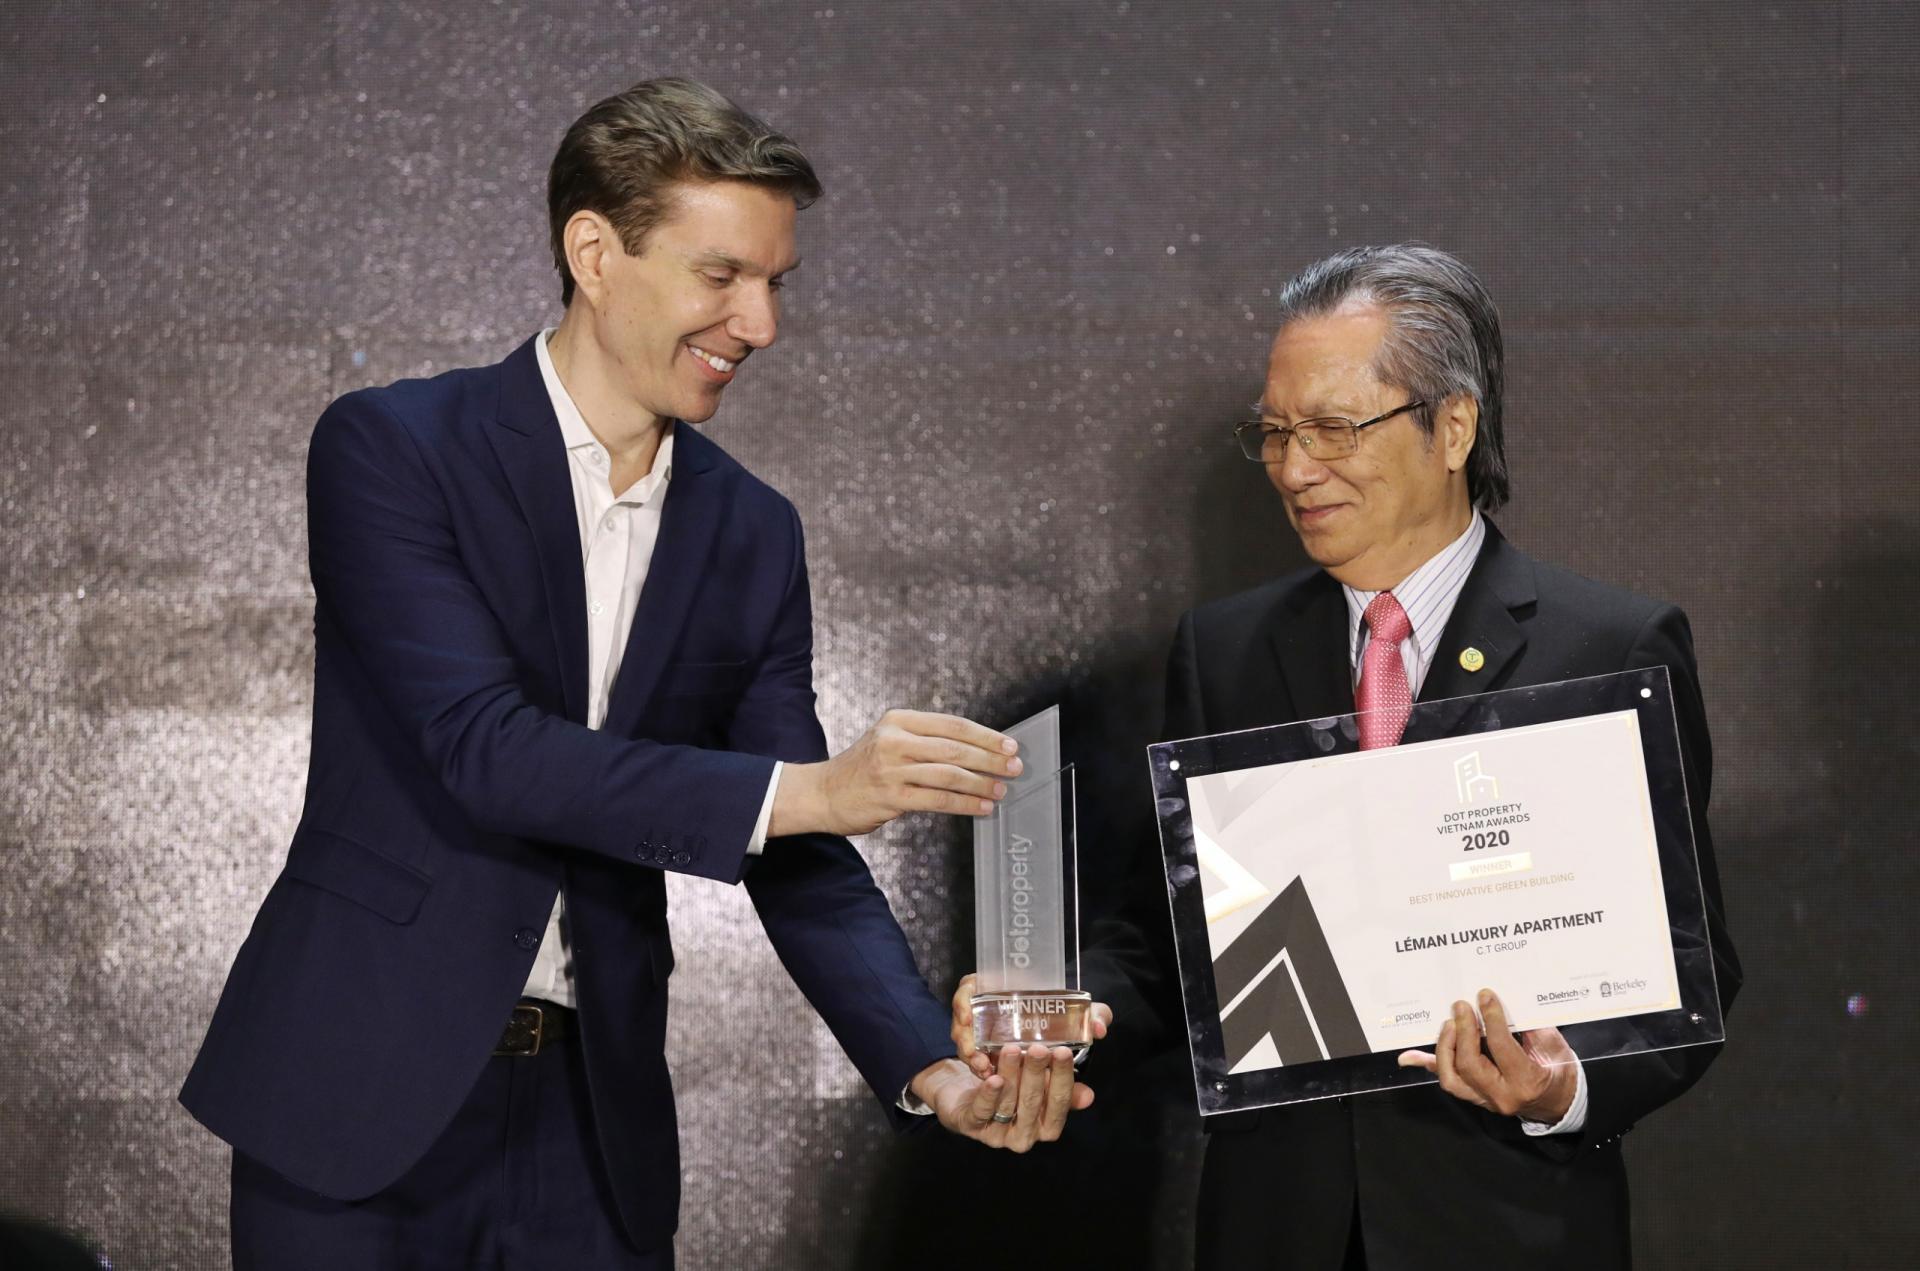 leman luxury wins dot property award 2020 for best innovative green building